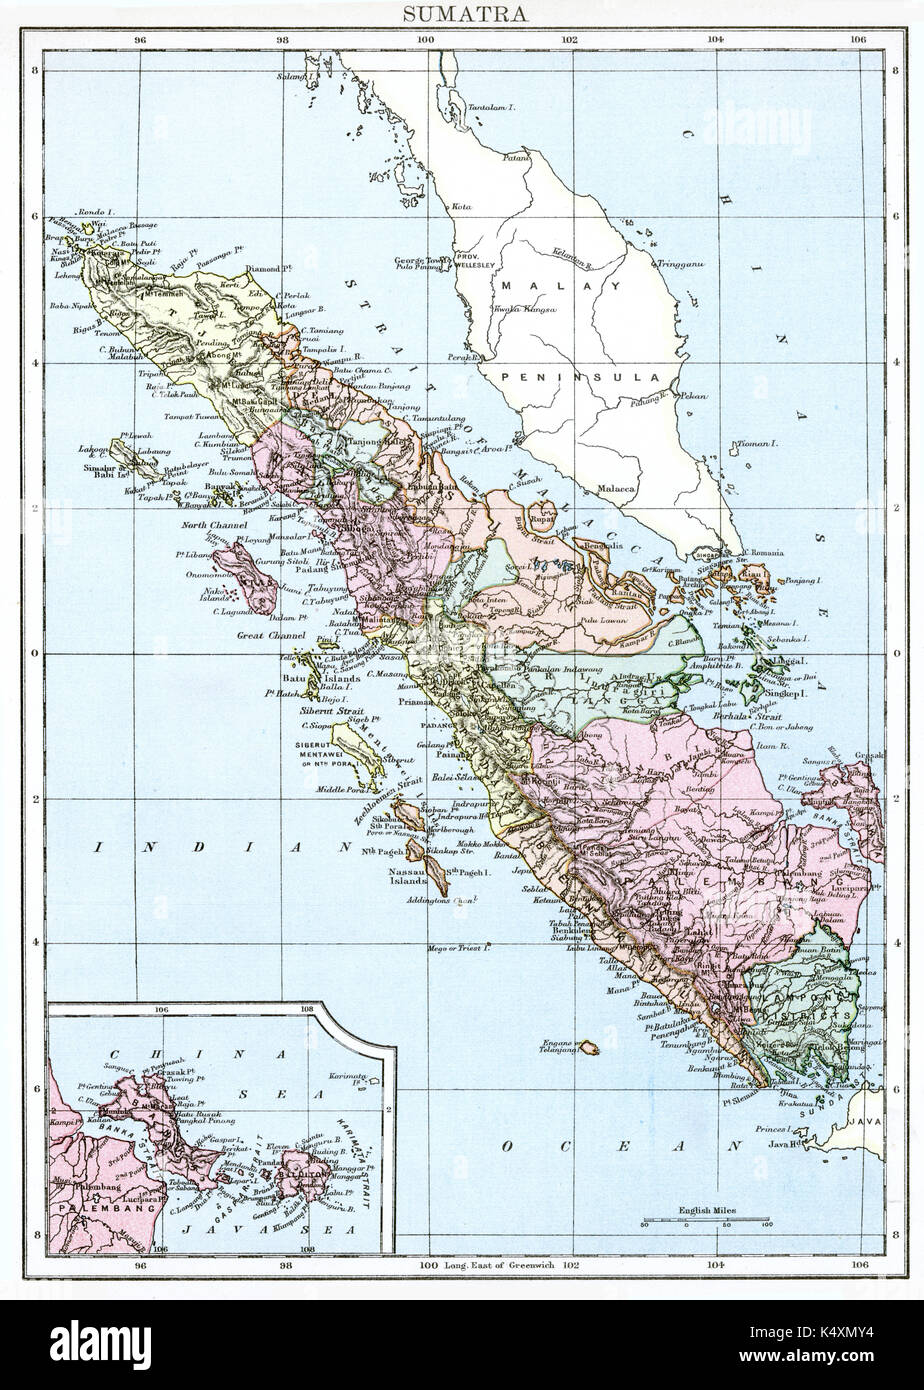 Antique map, circa 1875, of Sumatra - Stock Image